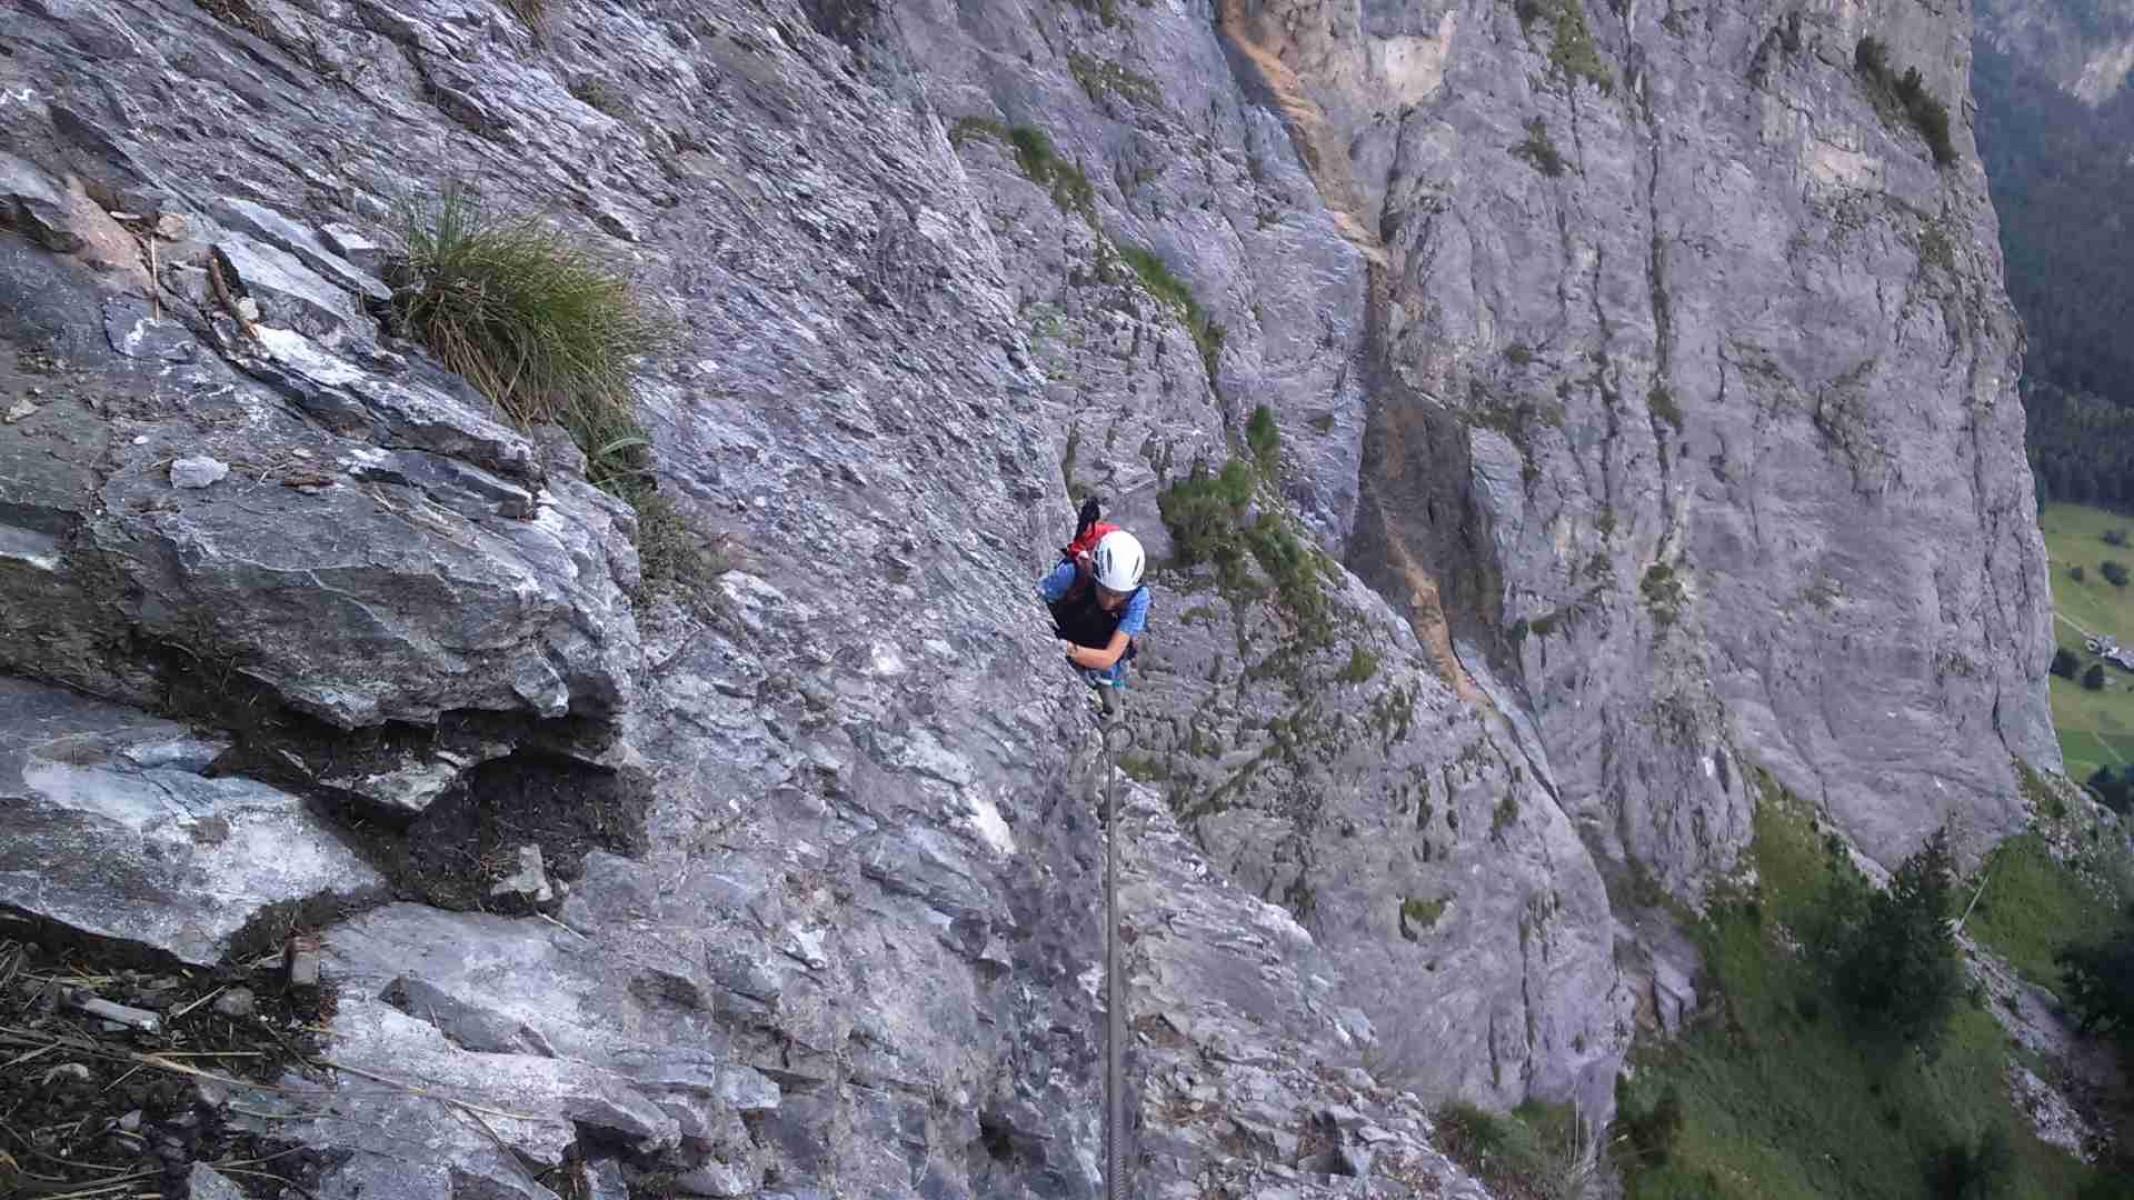 Klettersteig Eiger : K eiger rotstock tourenberichte